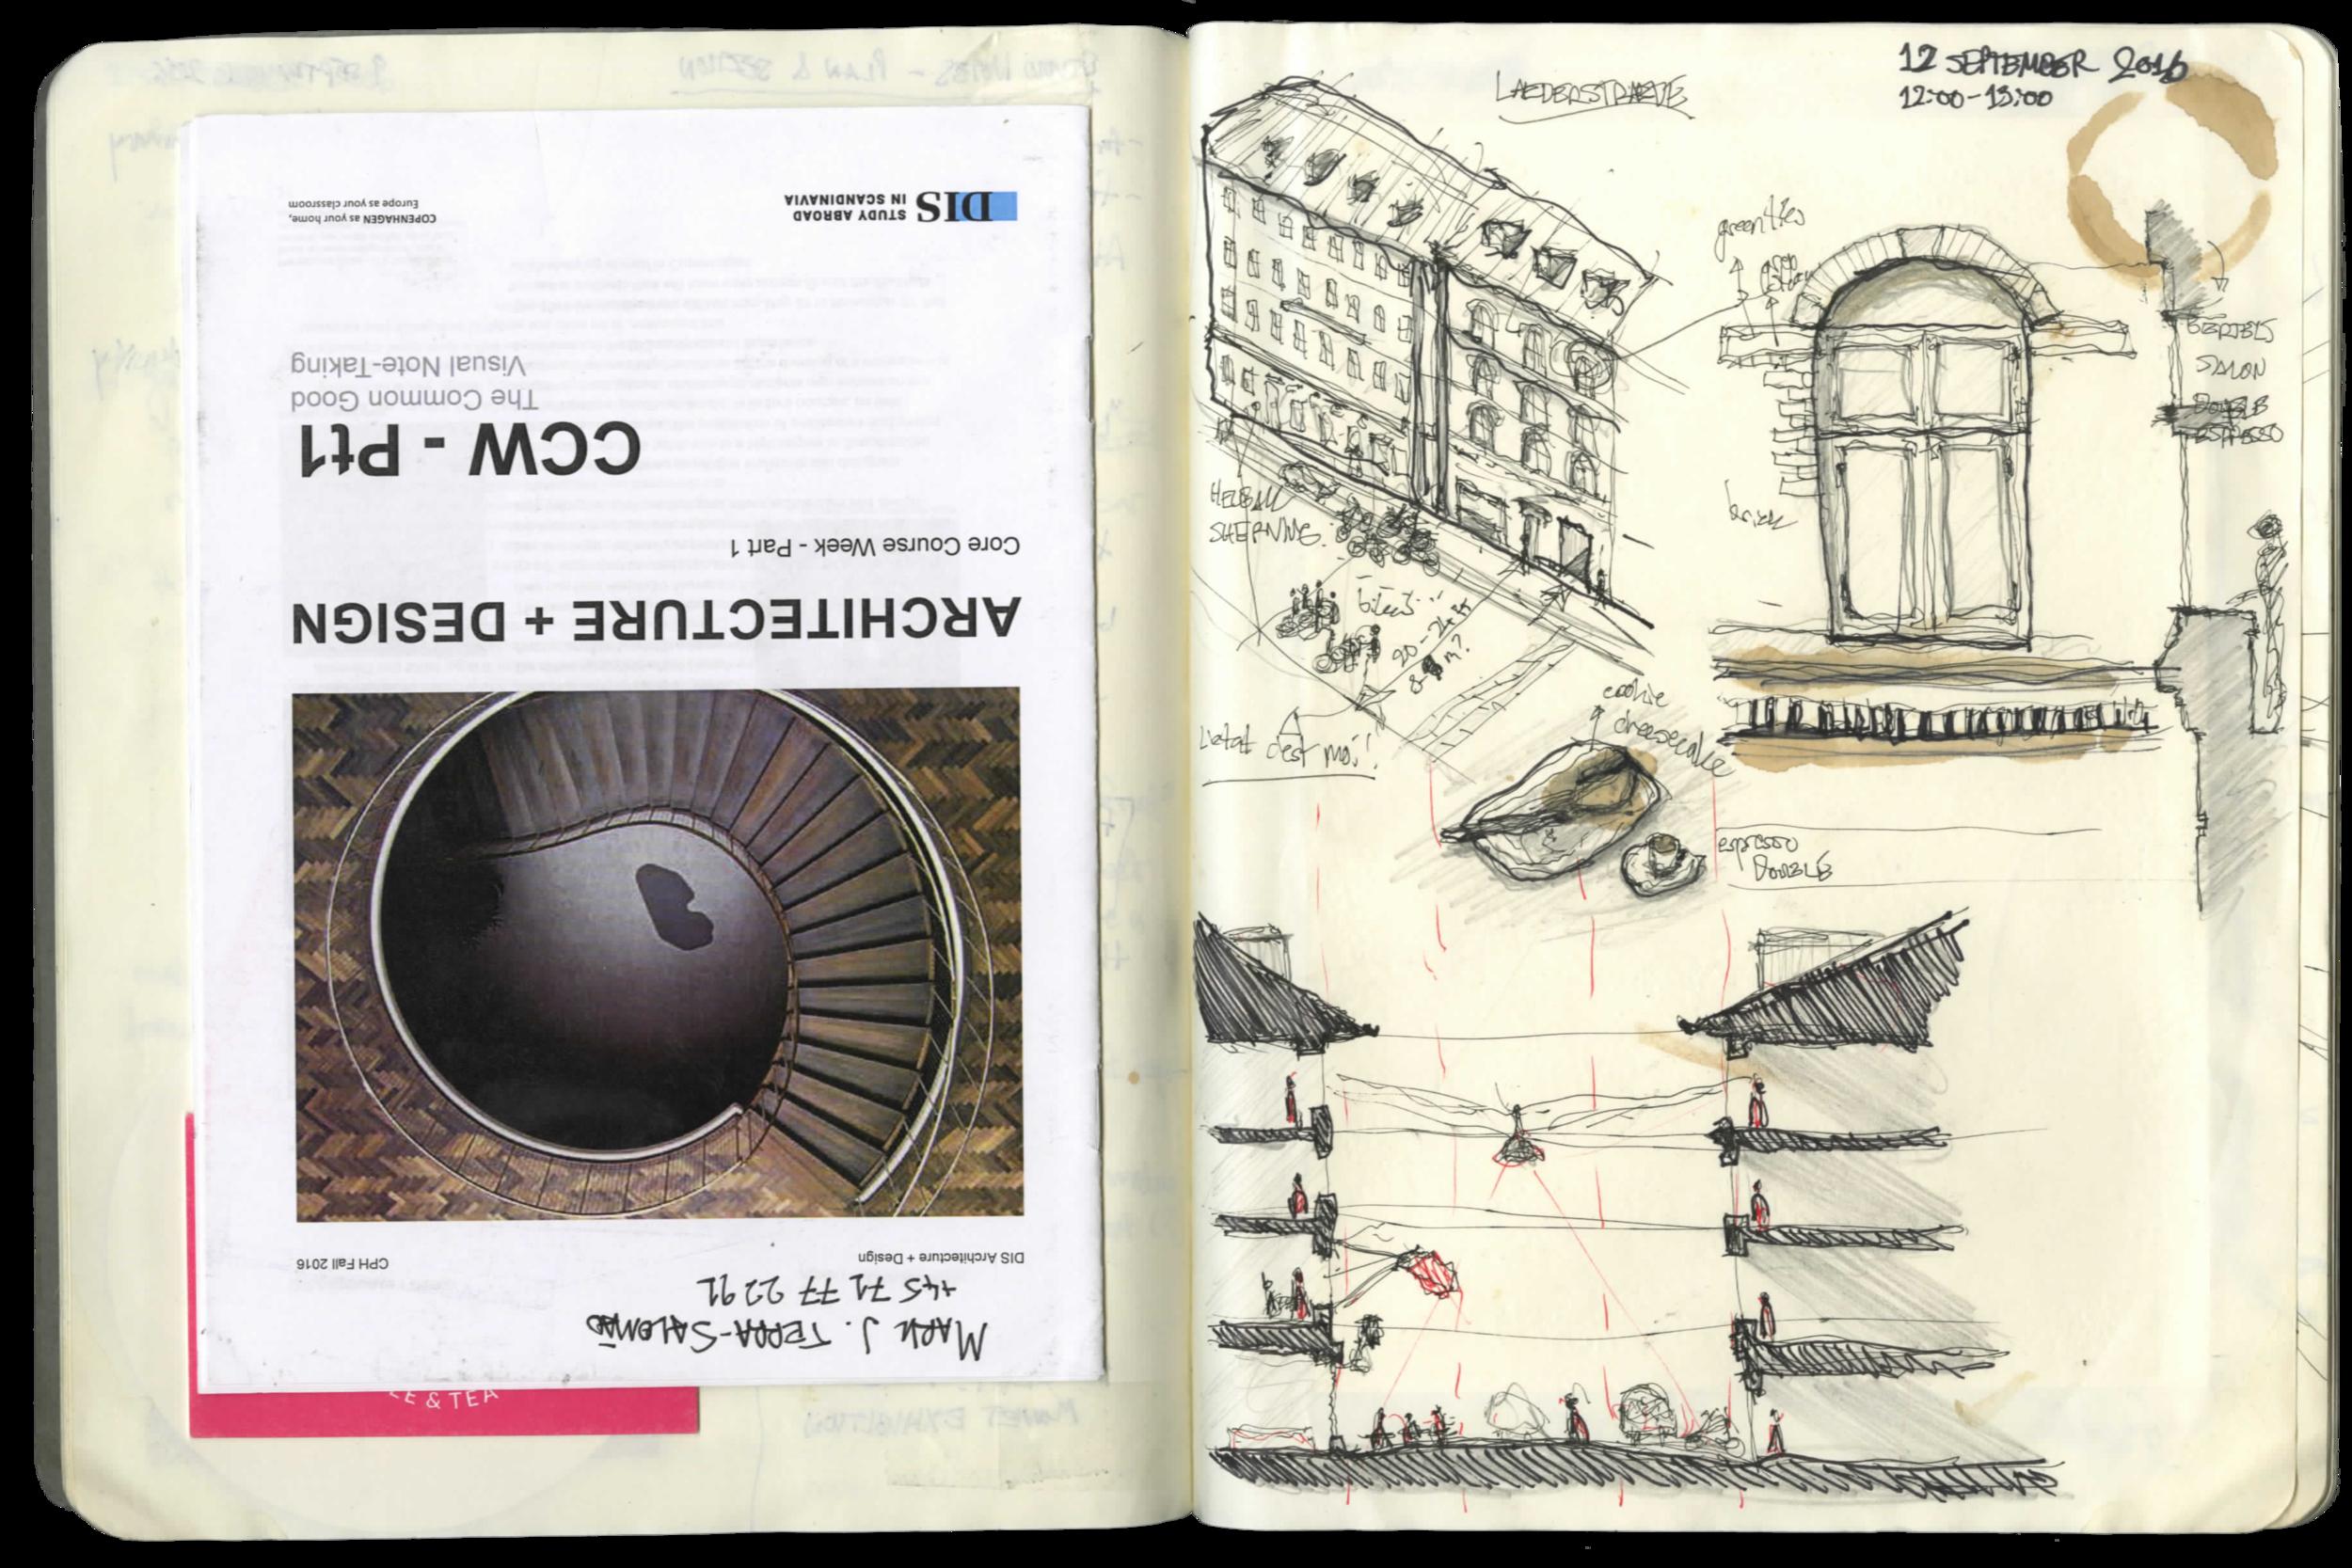 Mark_Terra-Salomão_Scandinavia_Sketchbook-10.png